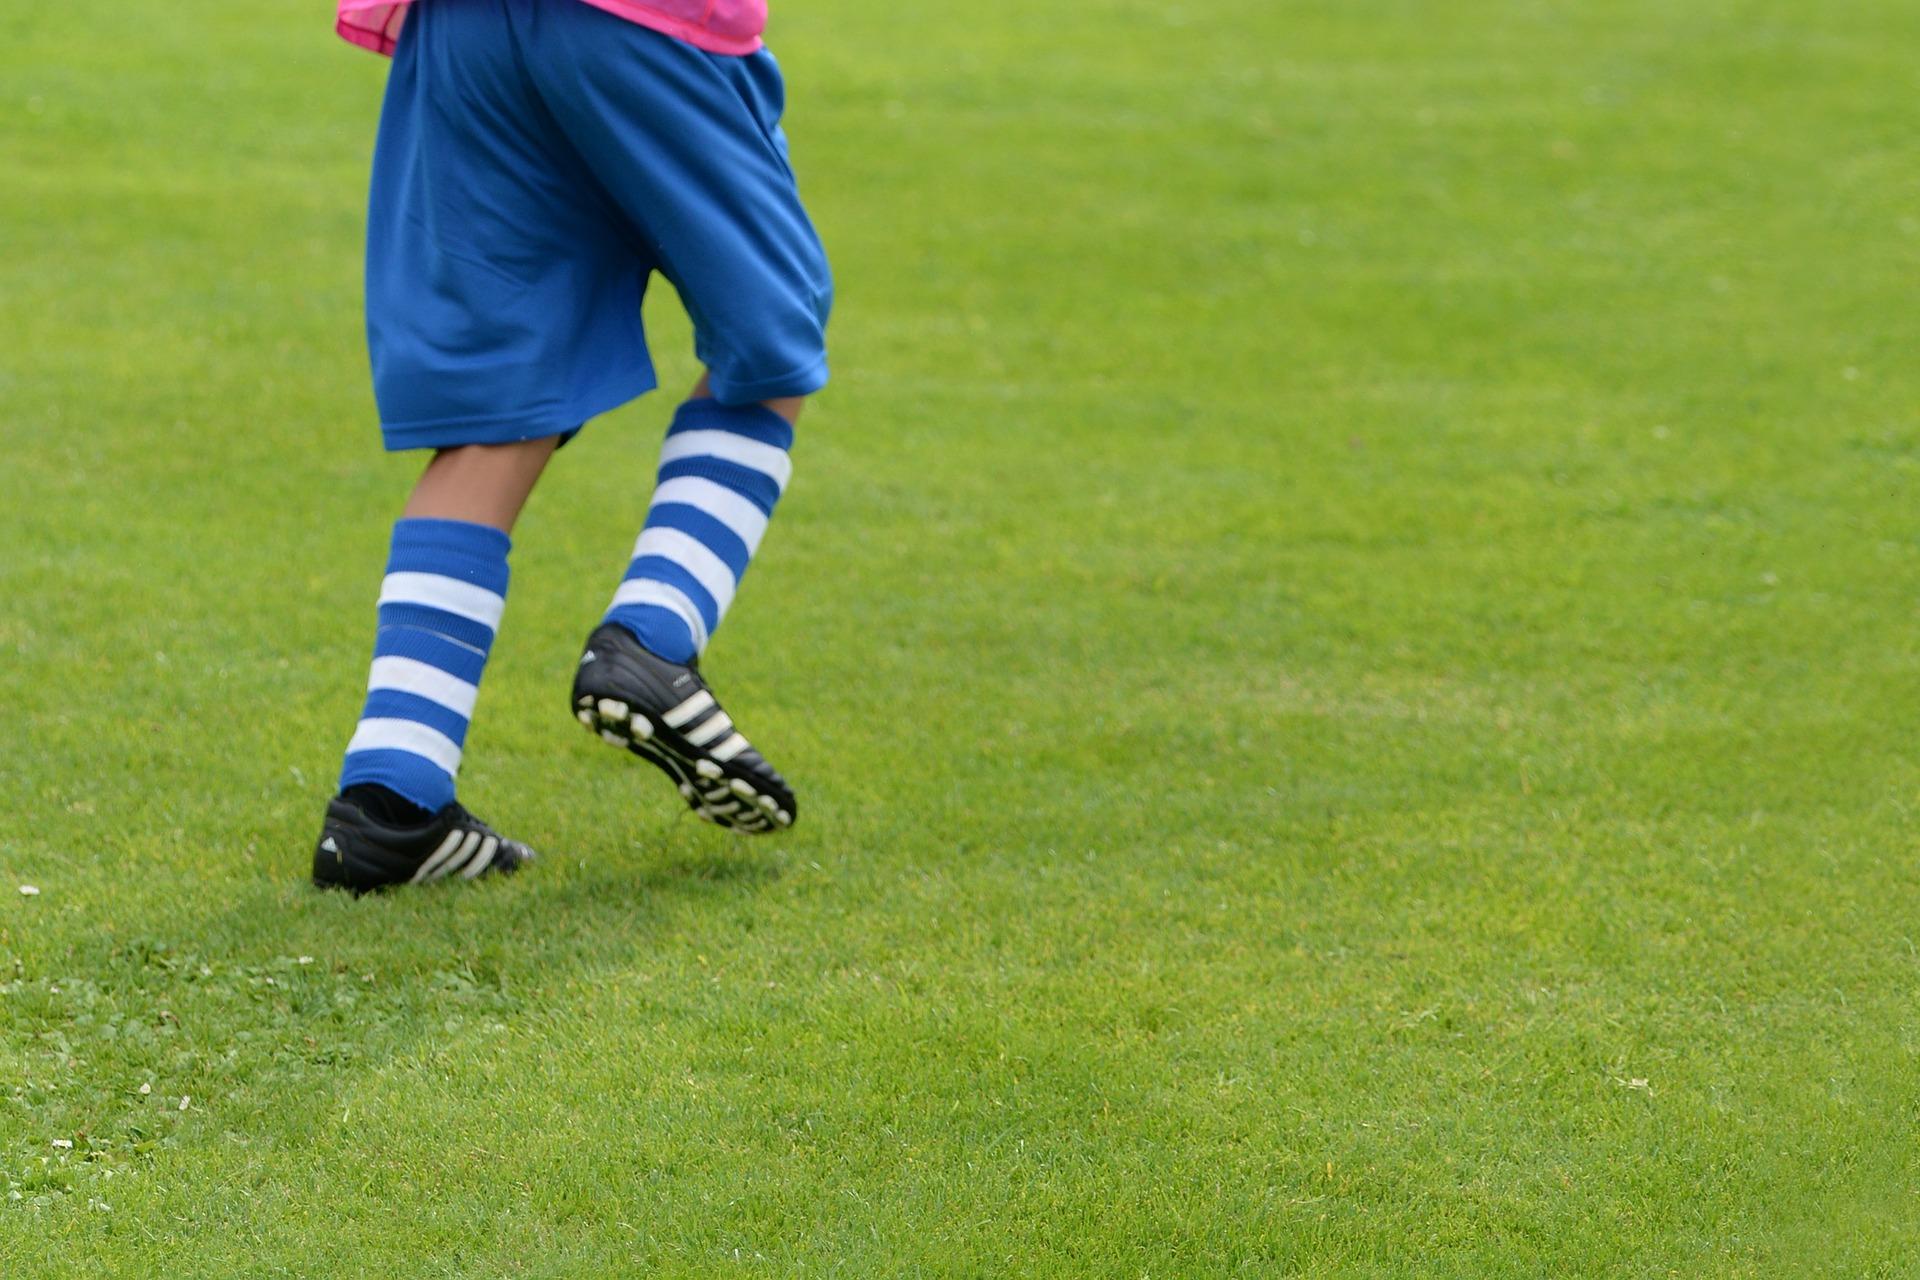 football-566025_1920.jpg